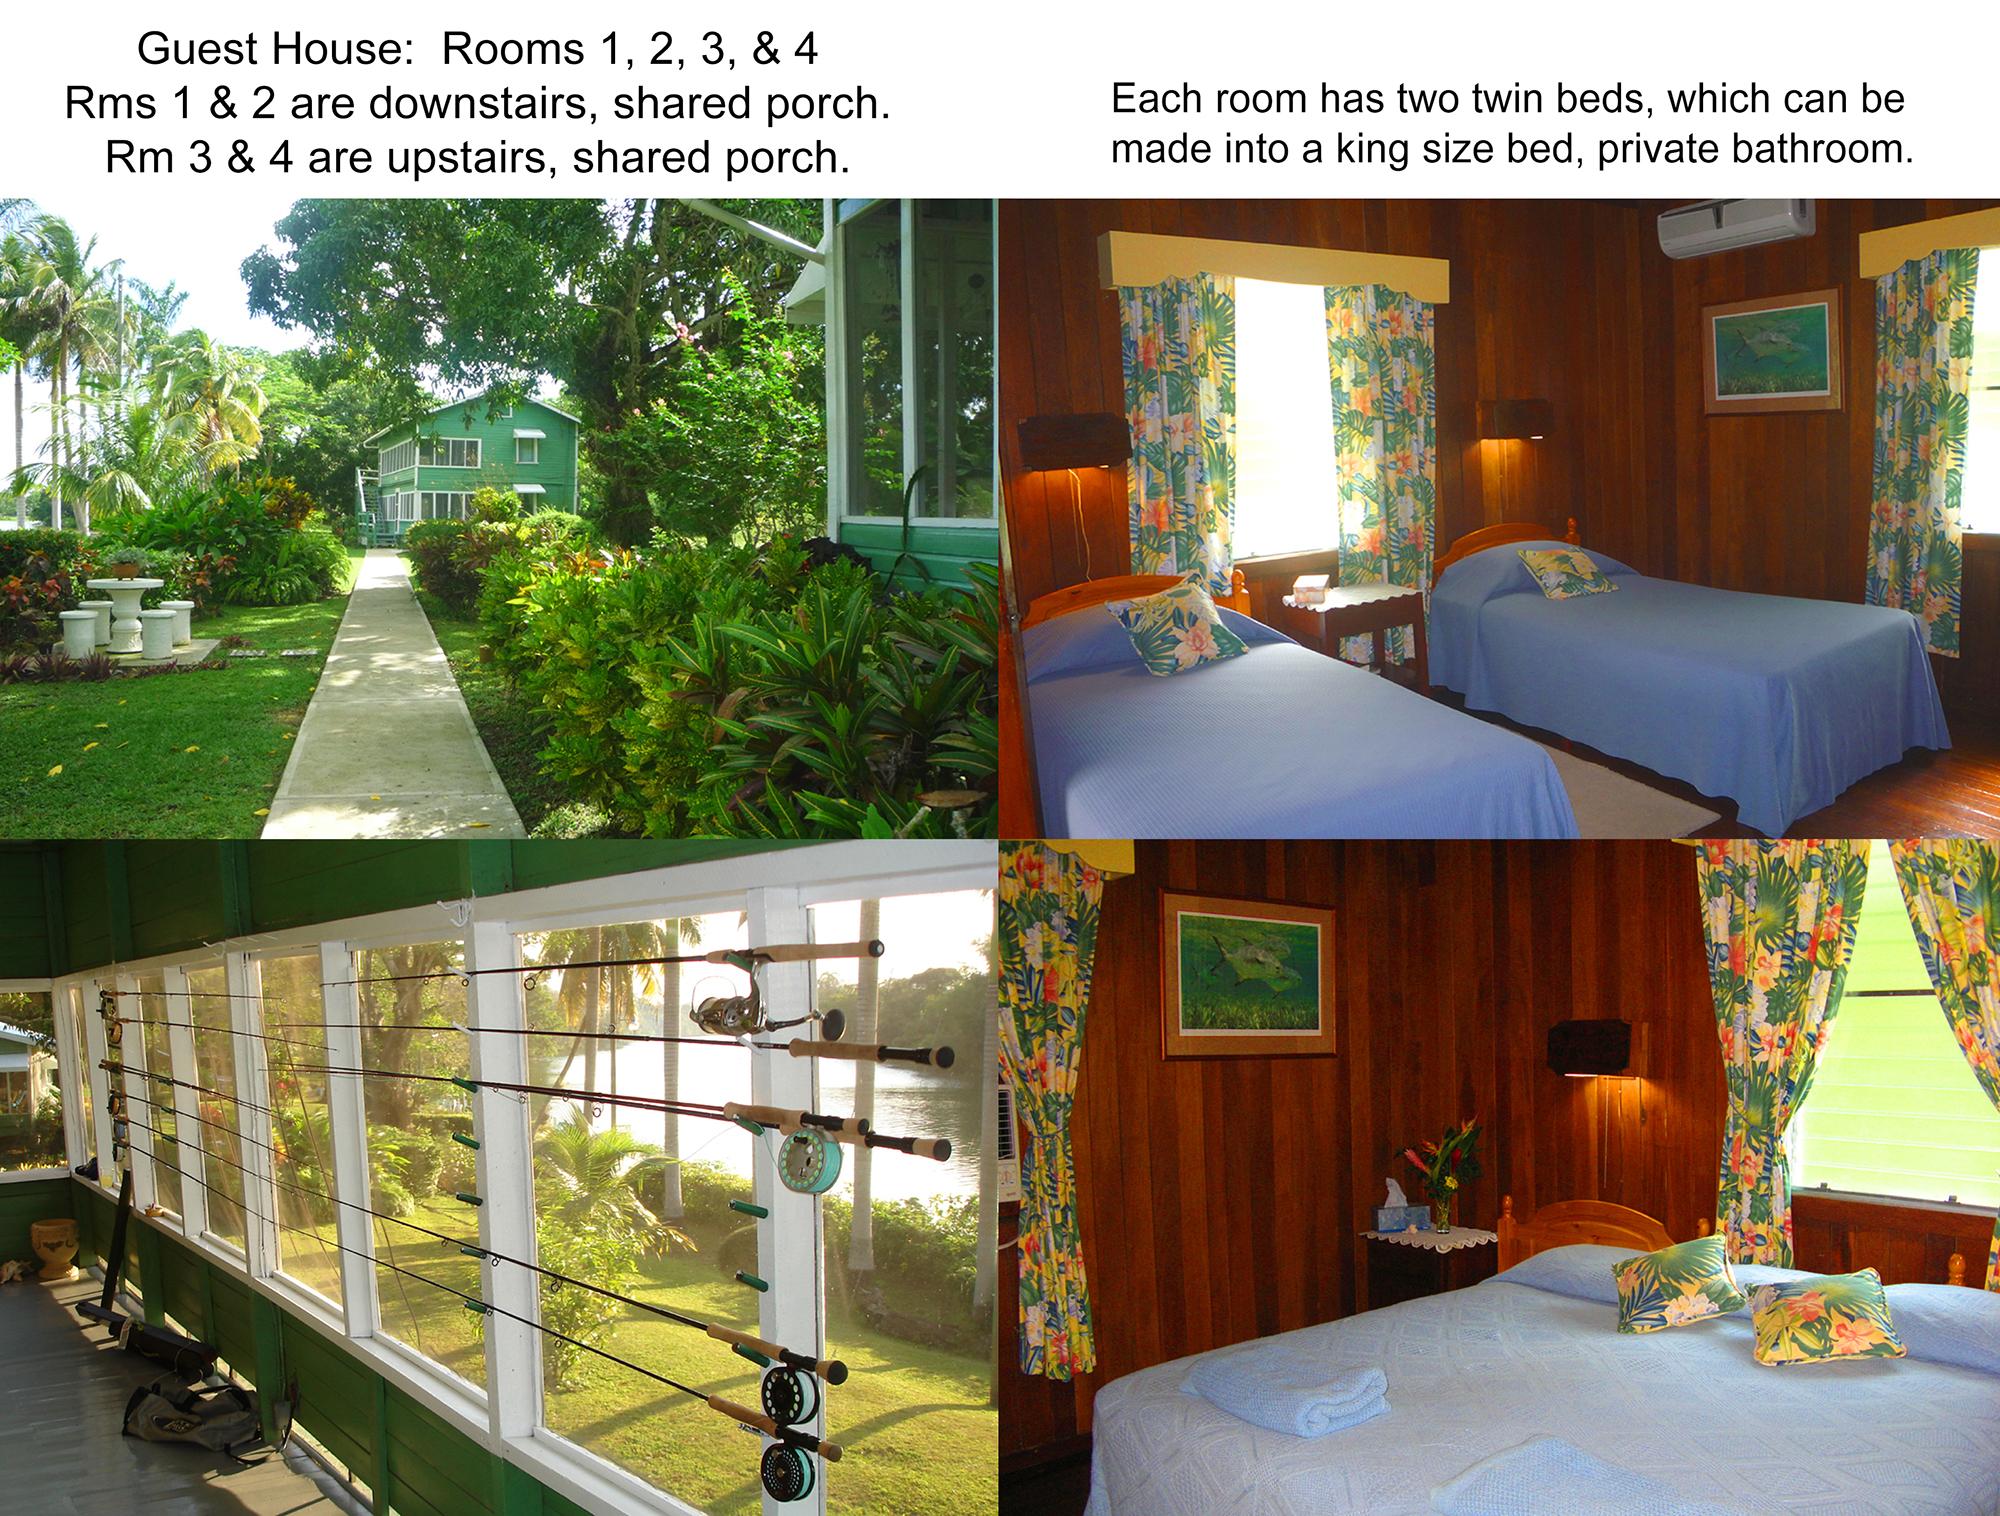 Plan Your Trip to Belize River Lodge | Belize River Lodge